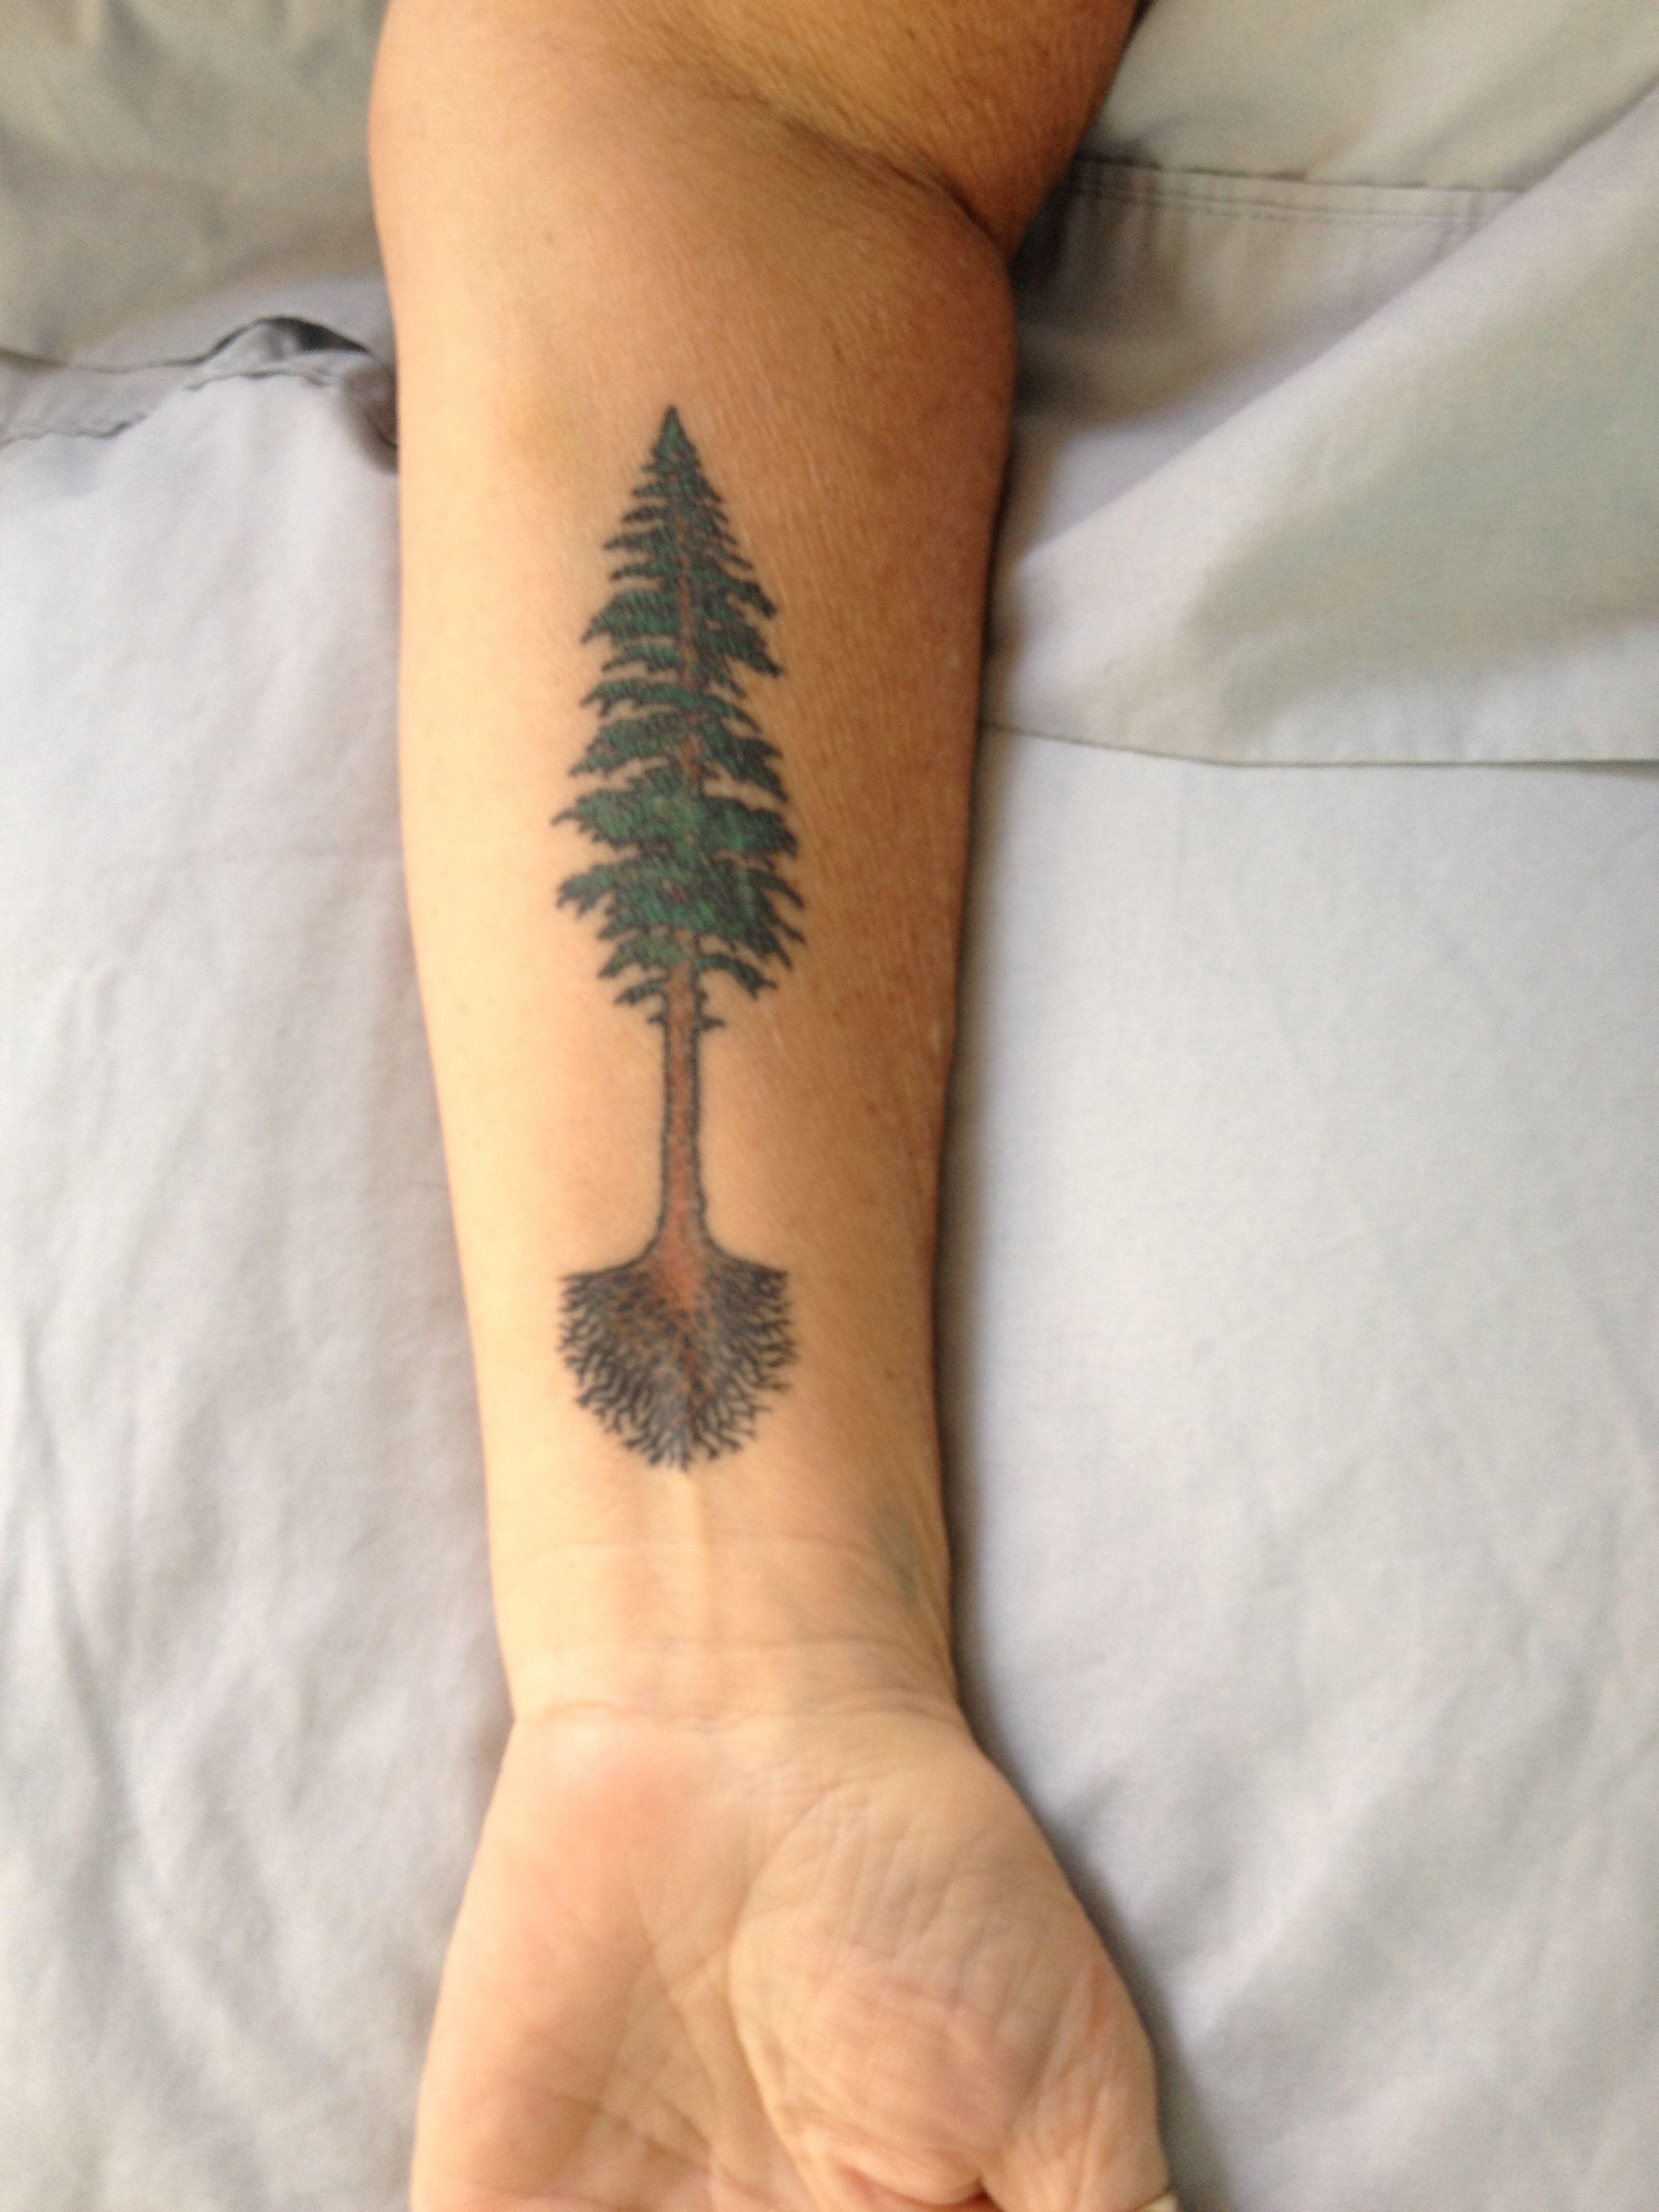 redwood tree tattoo designs pinterest tattoo tree tat and tatoo. Black Bedroom Furniture Sets. Home Design Ideas